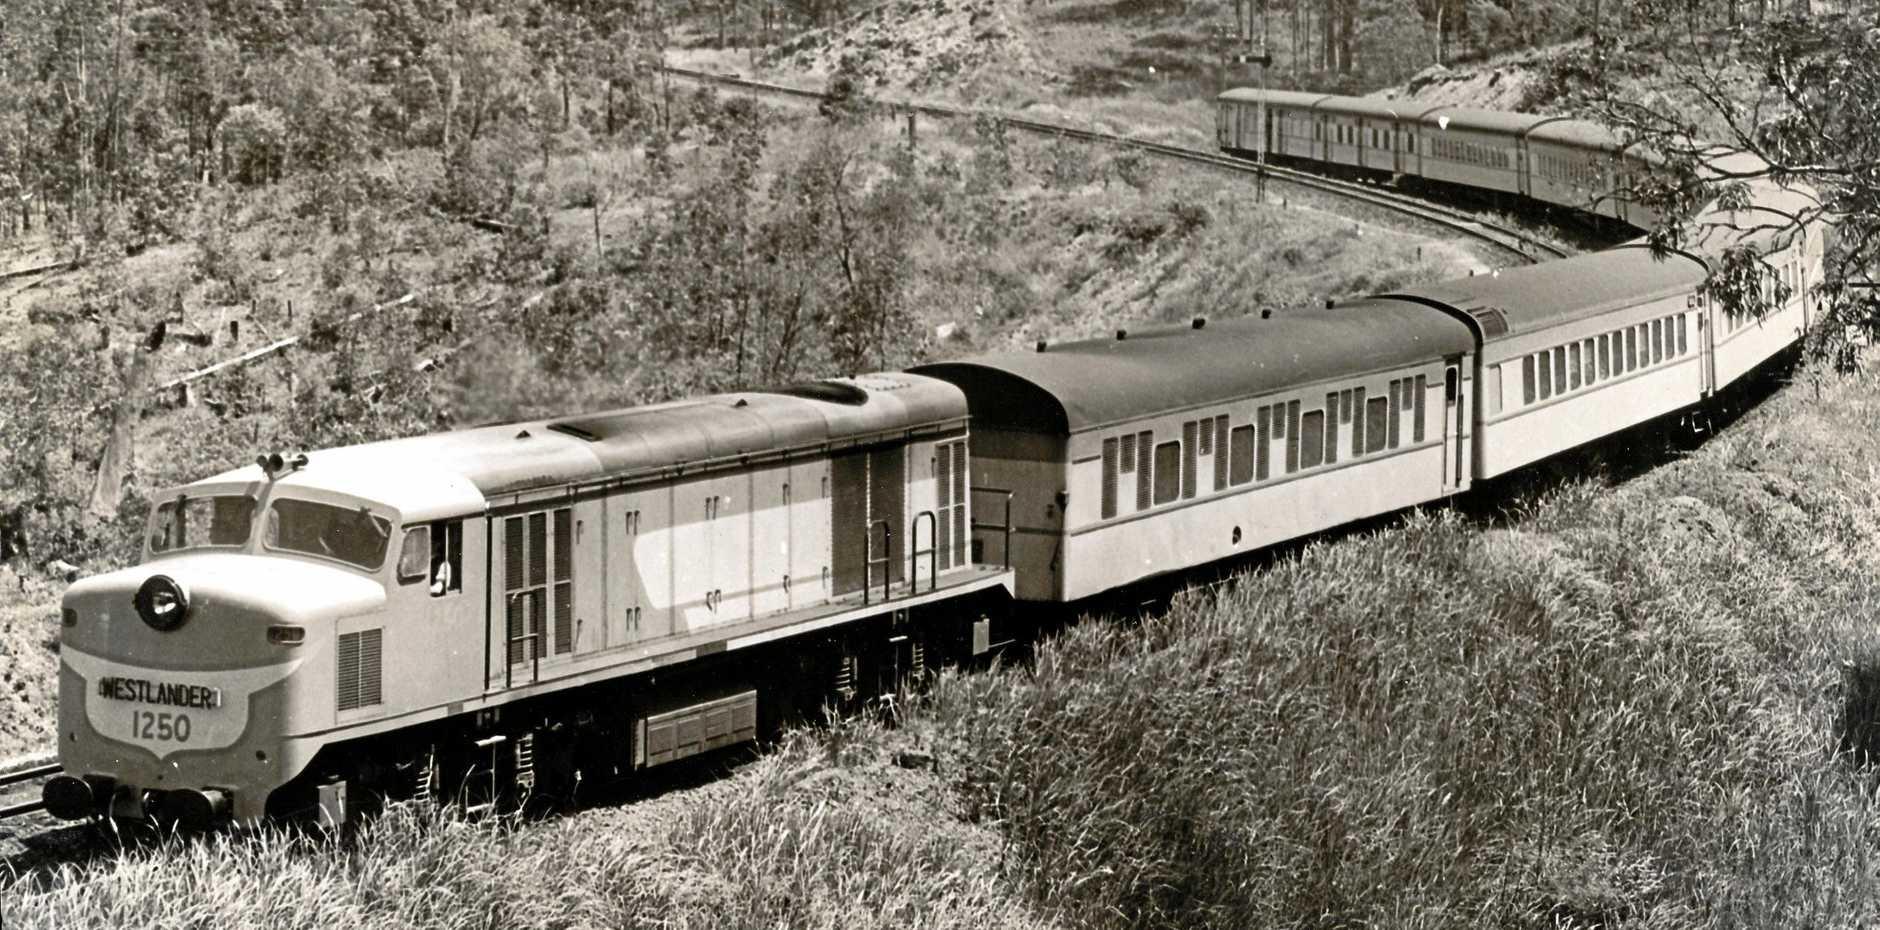 The Westlander in the 1950s